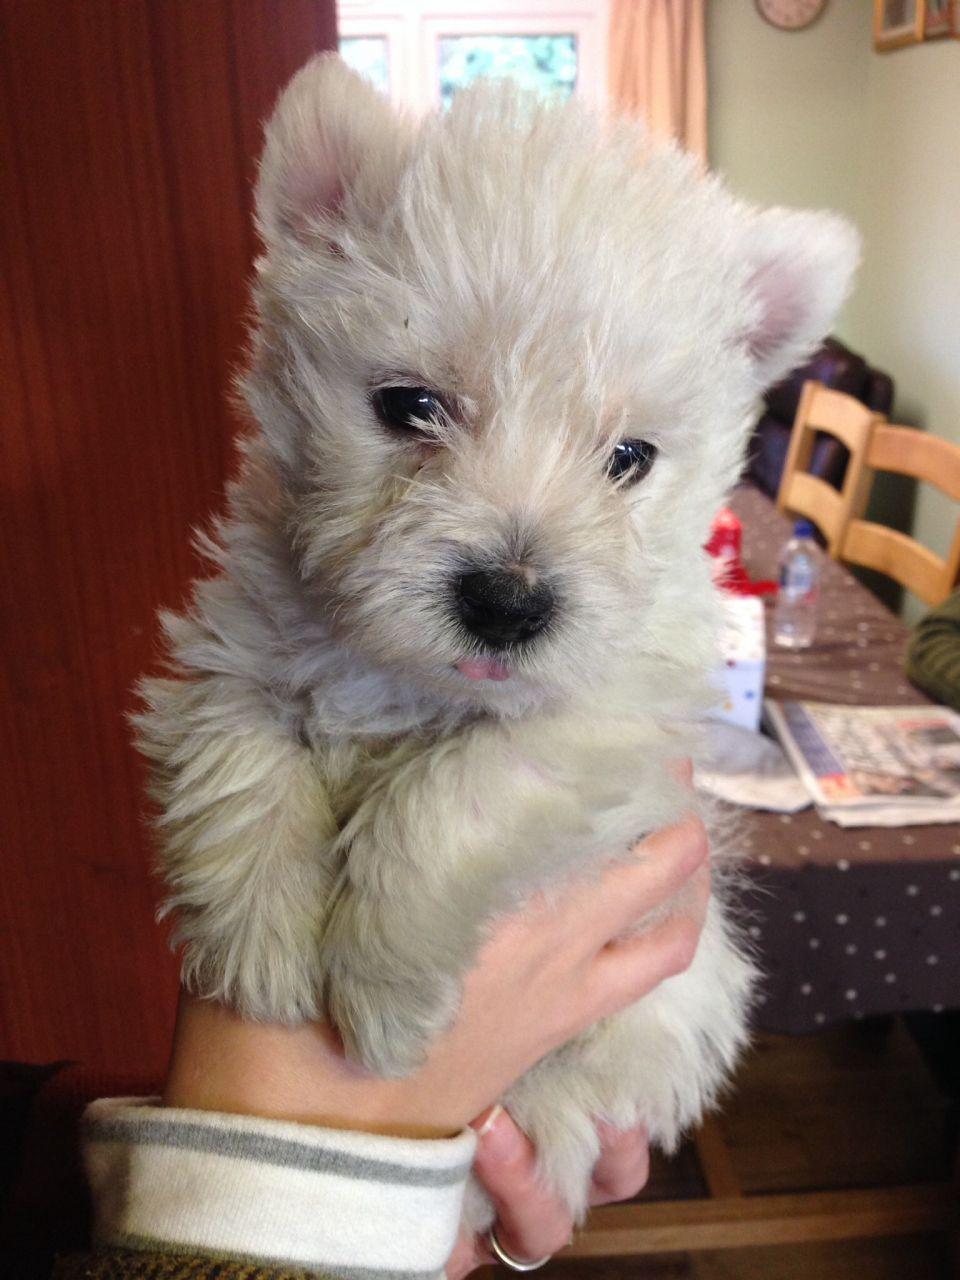 Gorgeous Westie Puppies For Sale 52bdbd27f29ec Jpg 960 1280 Westie Puppies Puppies Westie Puppies For Sale